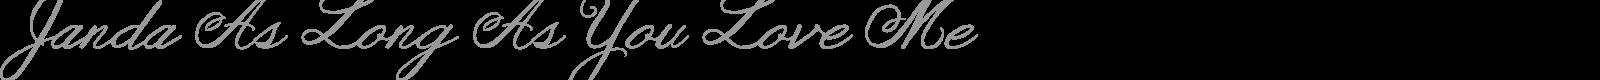 Download Free Font Janda Celebration Script